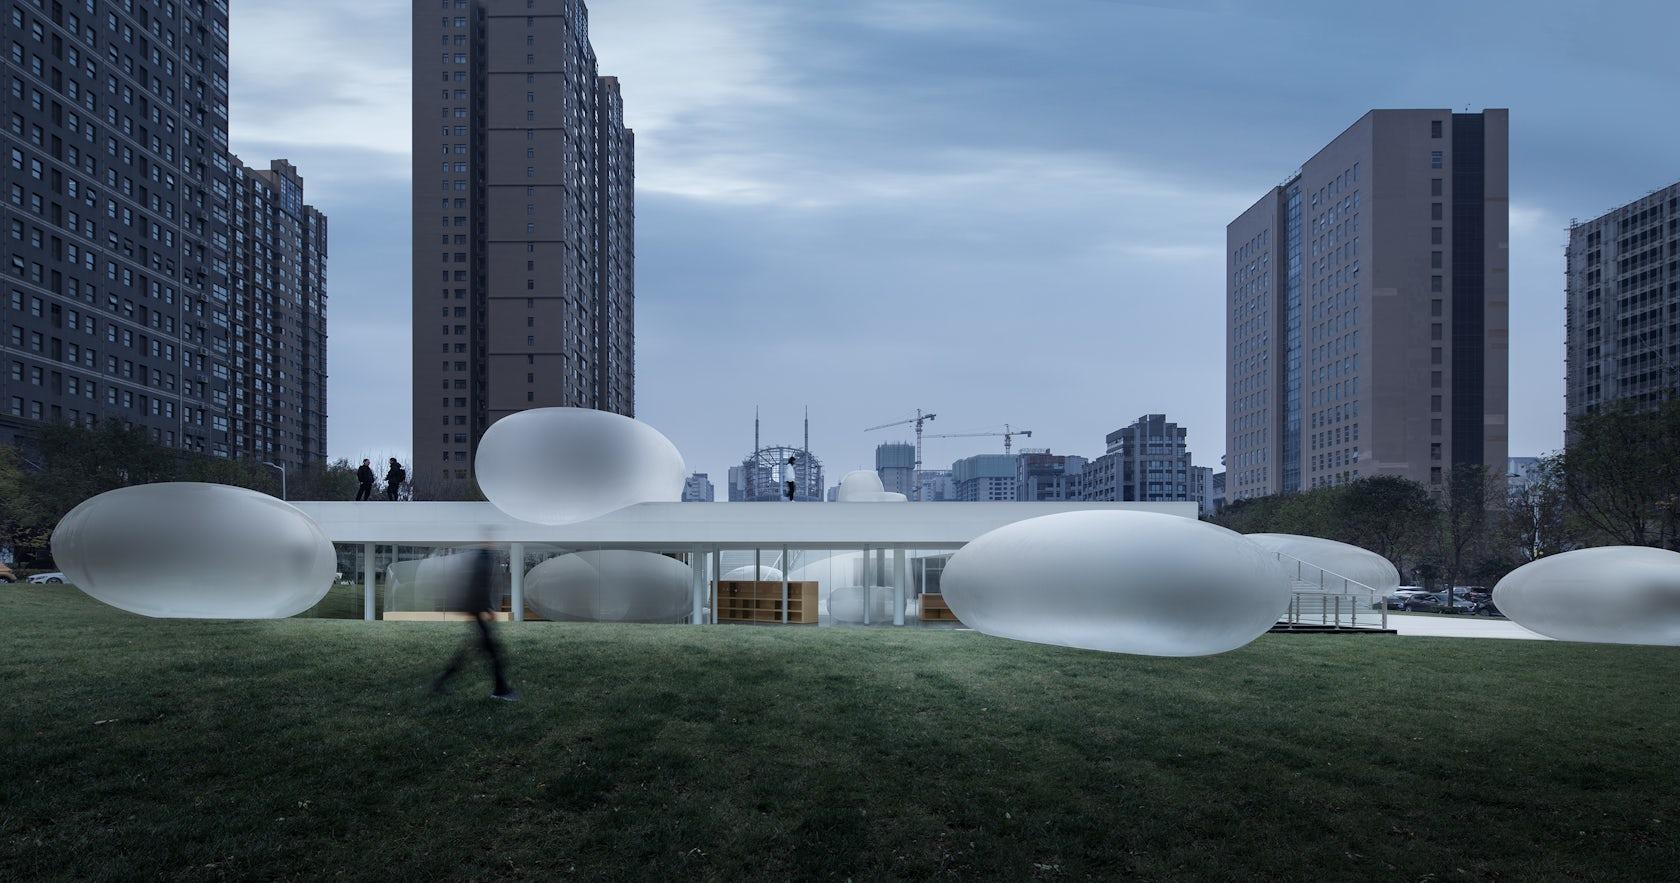 [Cheng Dong. A Coherent City] No. 12 public building